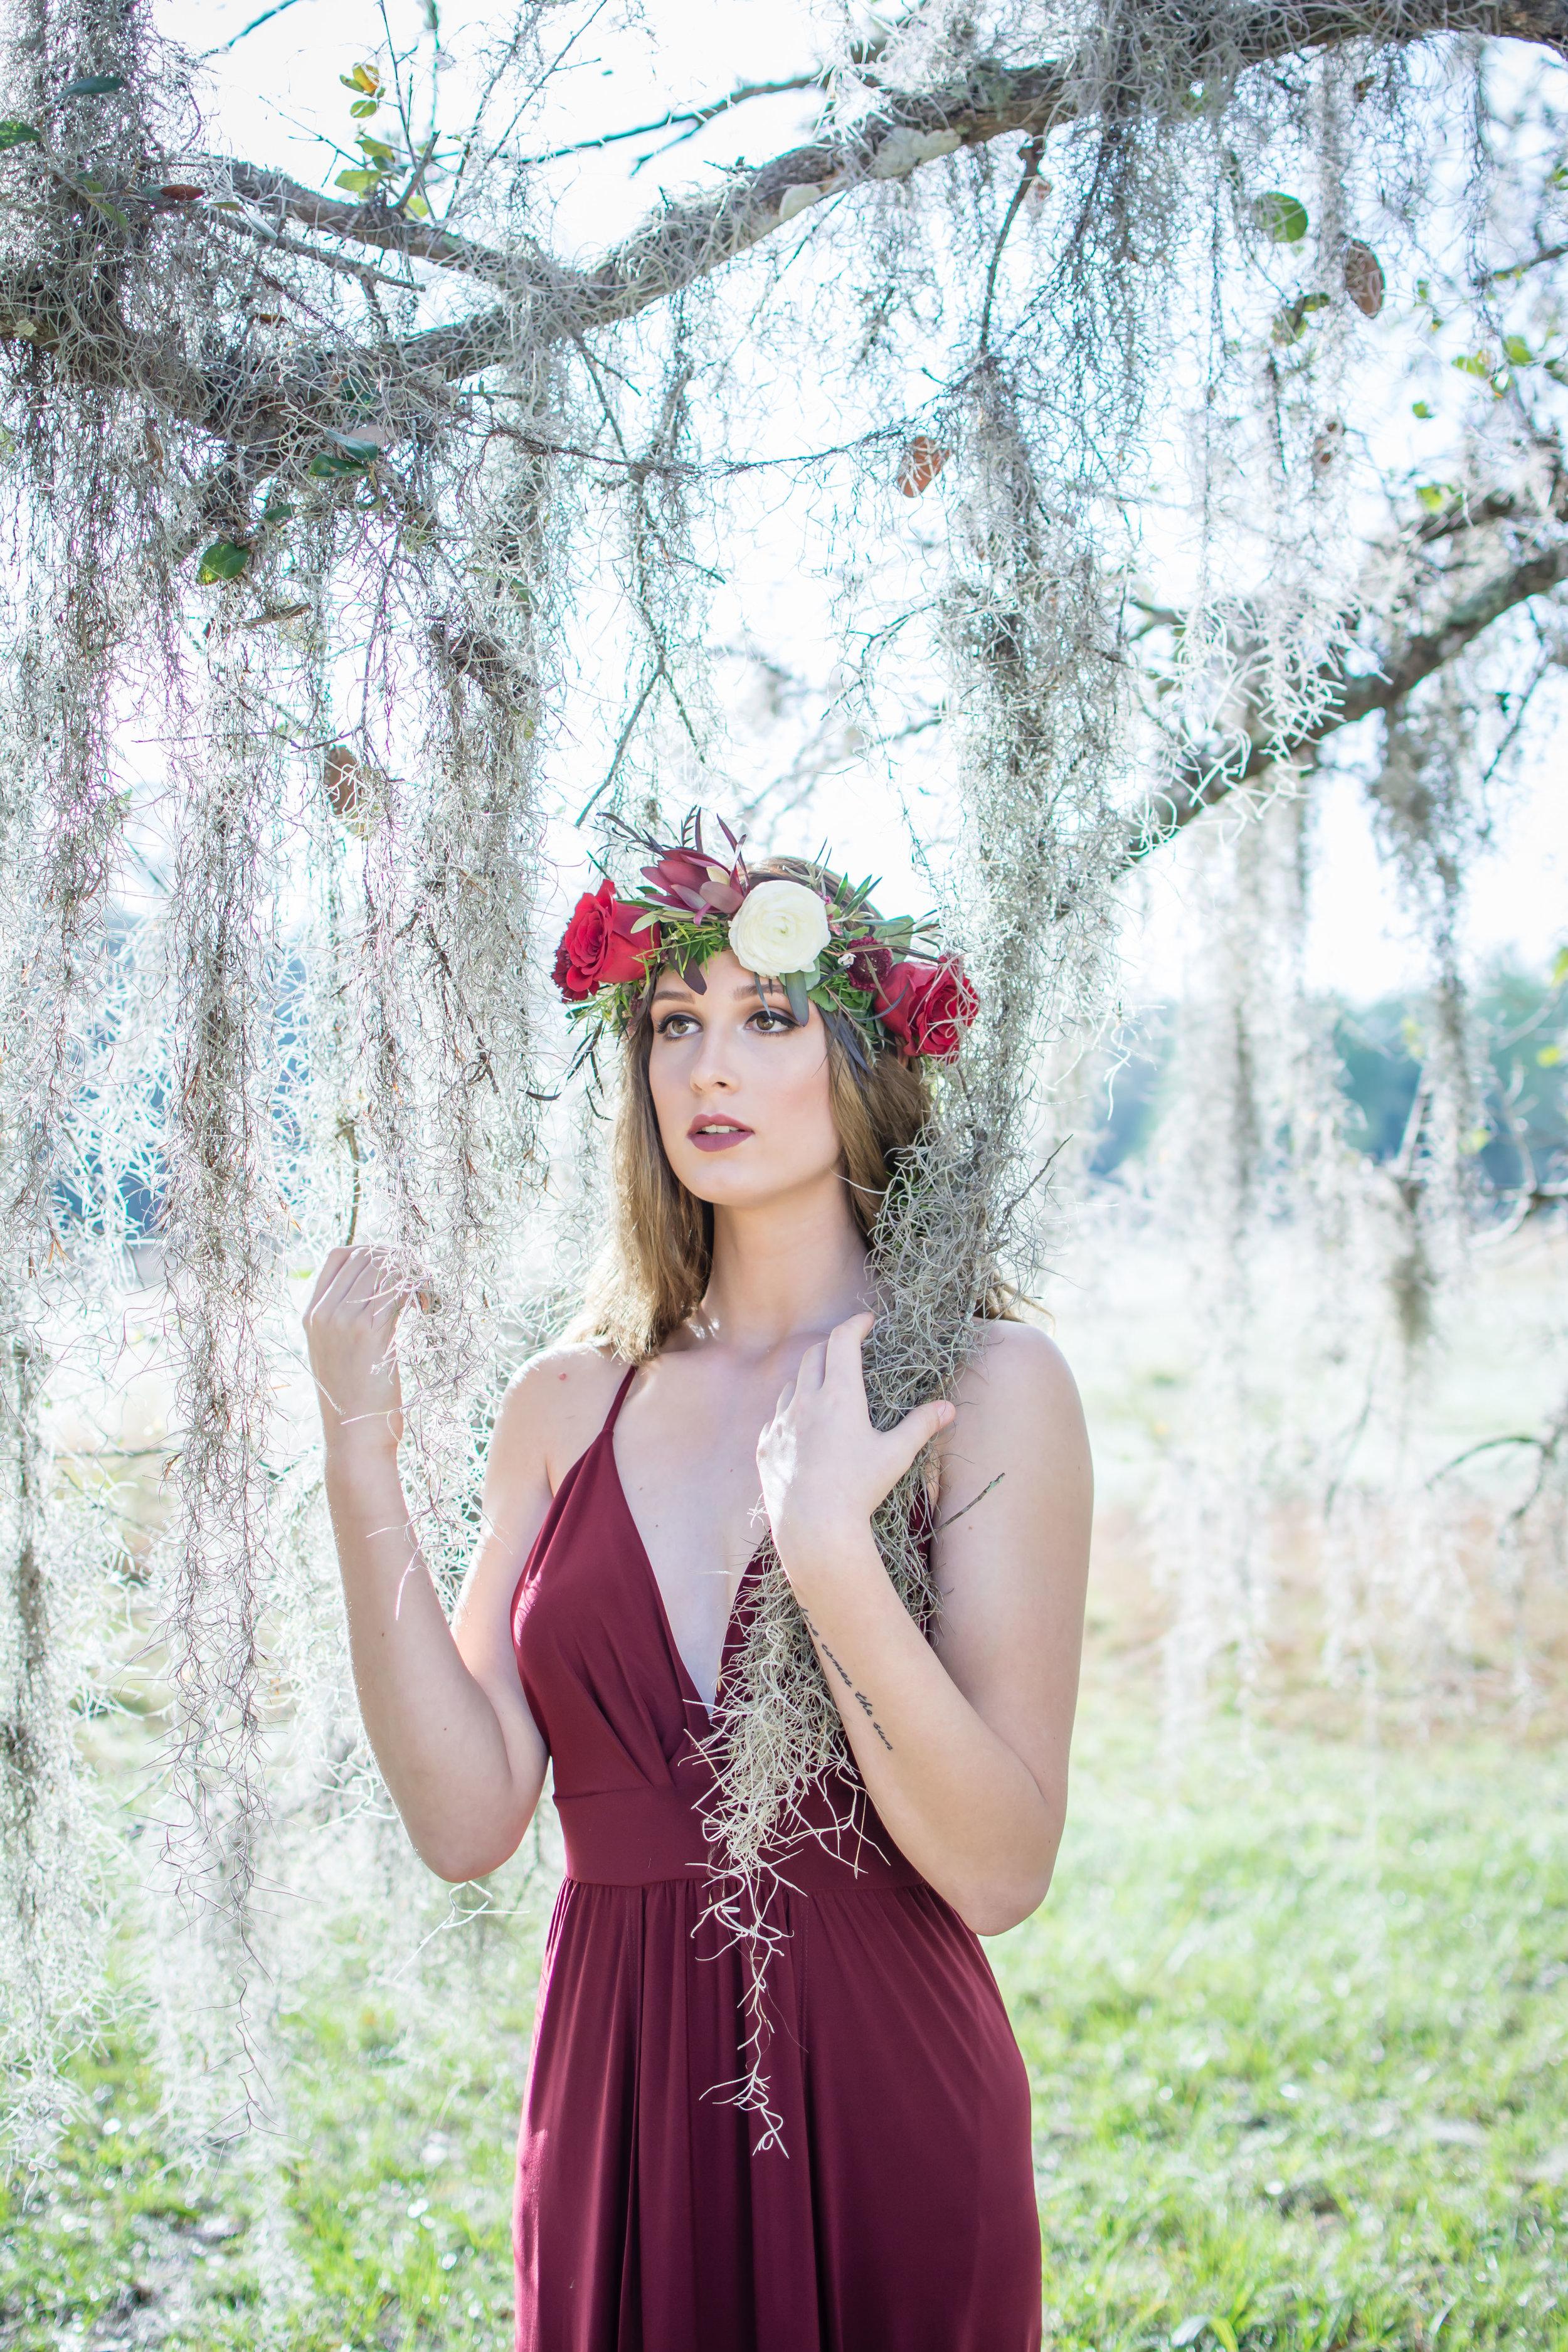 whimsical-bridal-inspiration-fashion-photoshoot-geneva-photographer-yanitza-ninett-21.jpg